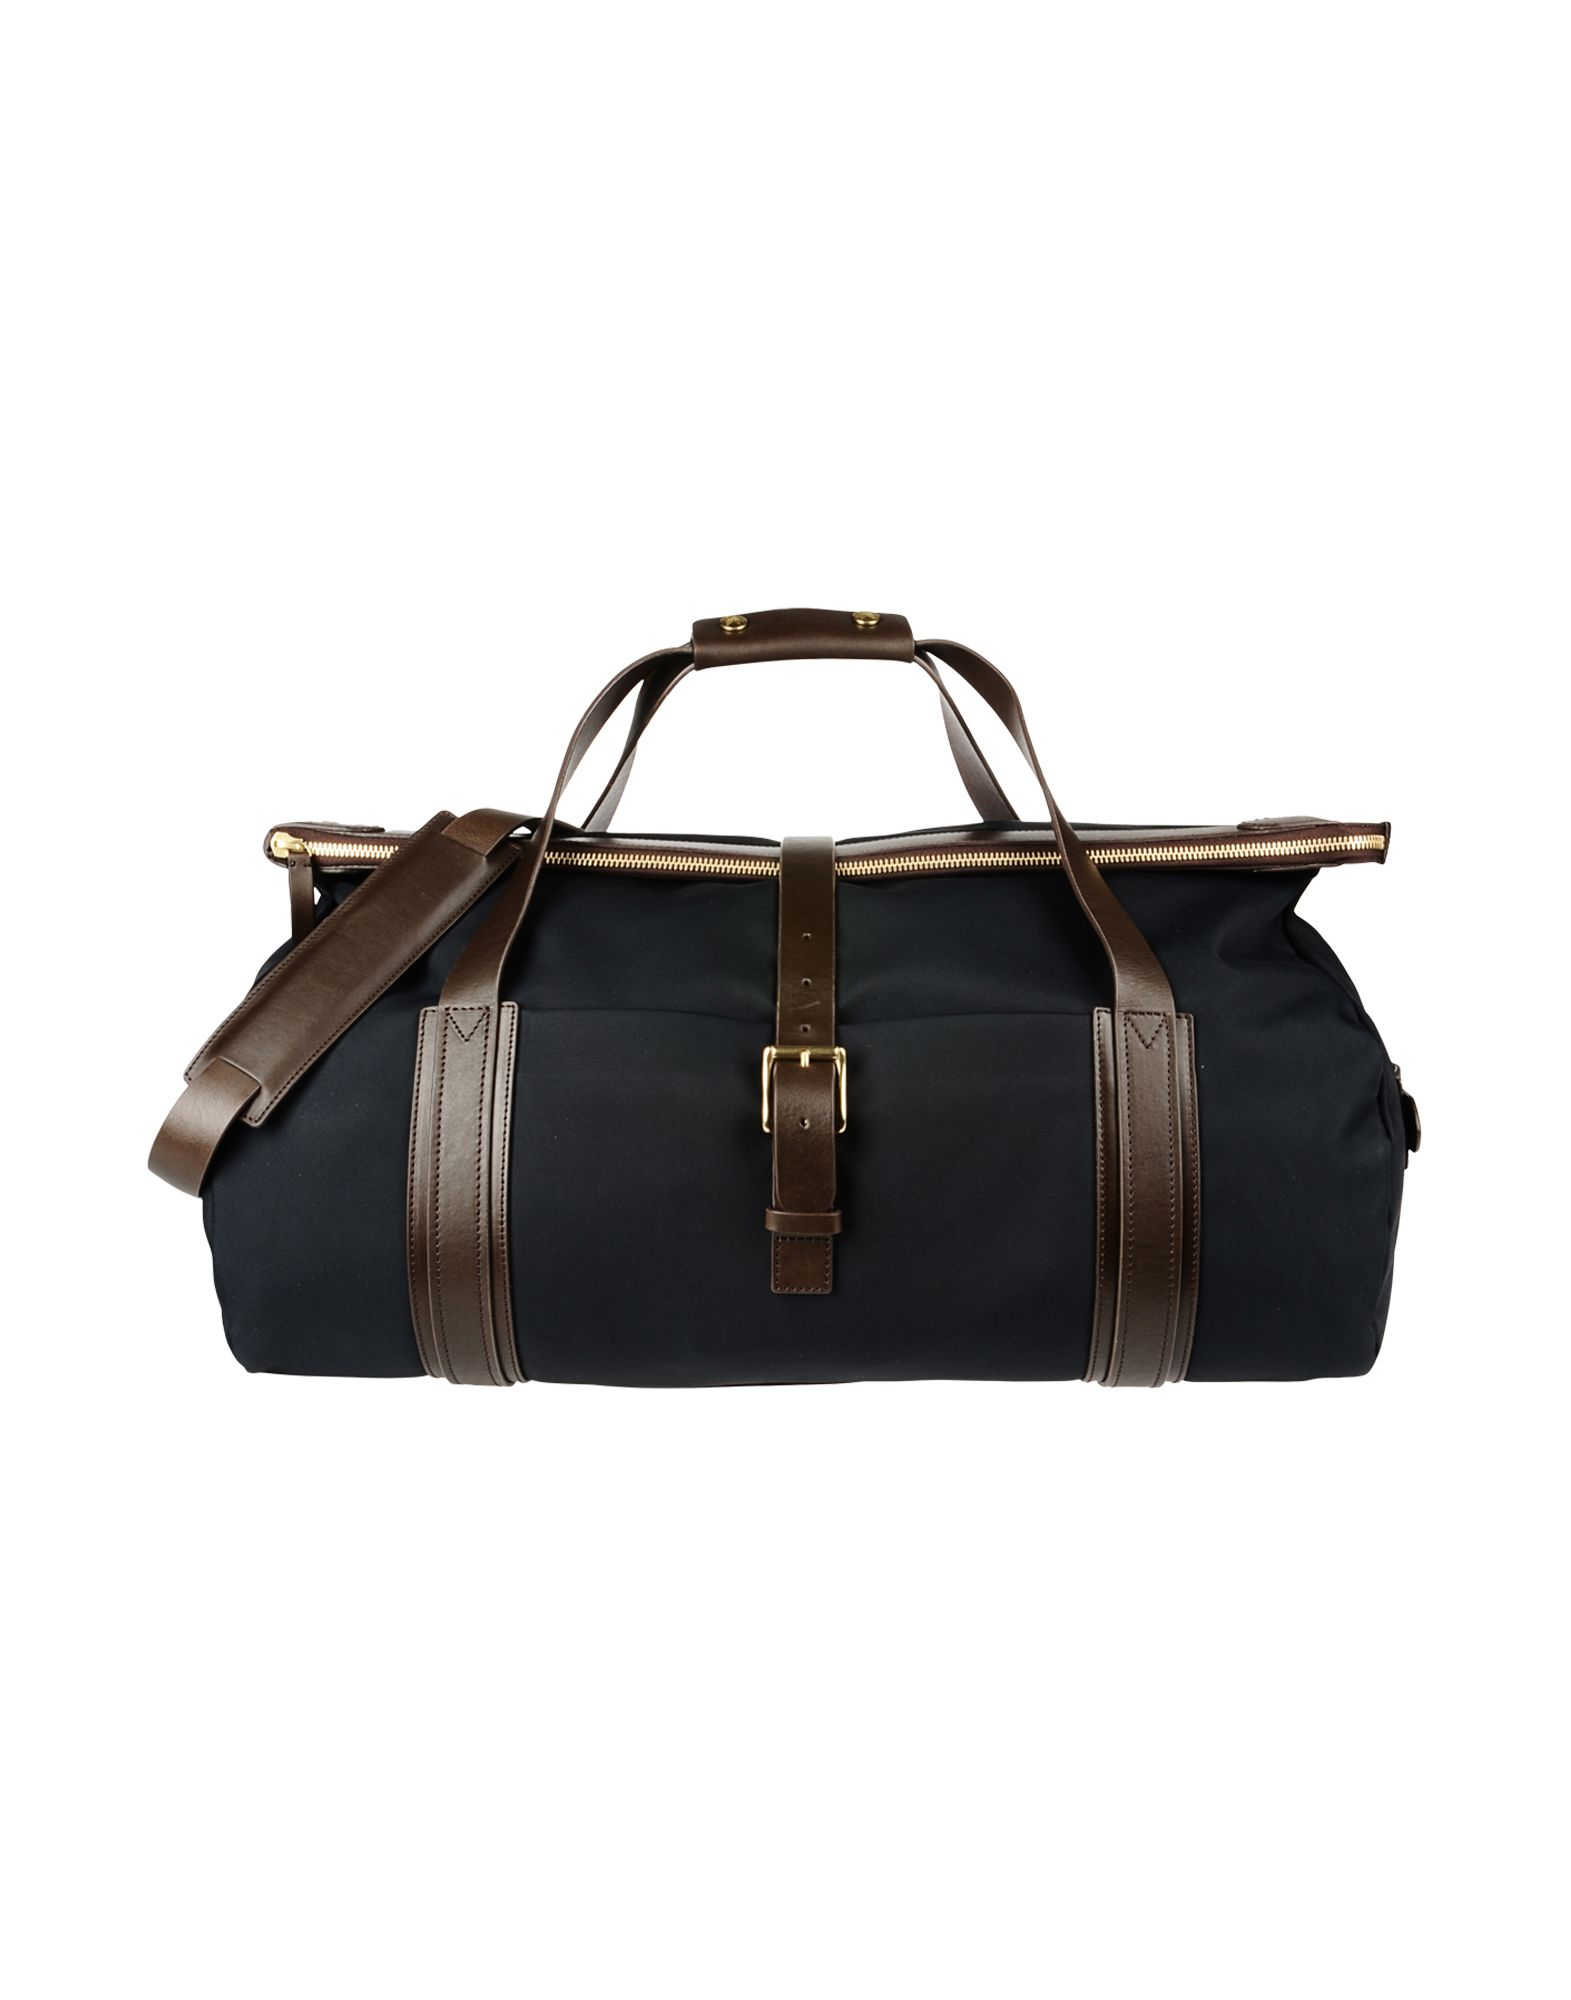 MISMO Travel & Duffel Bags in Dark Blue